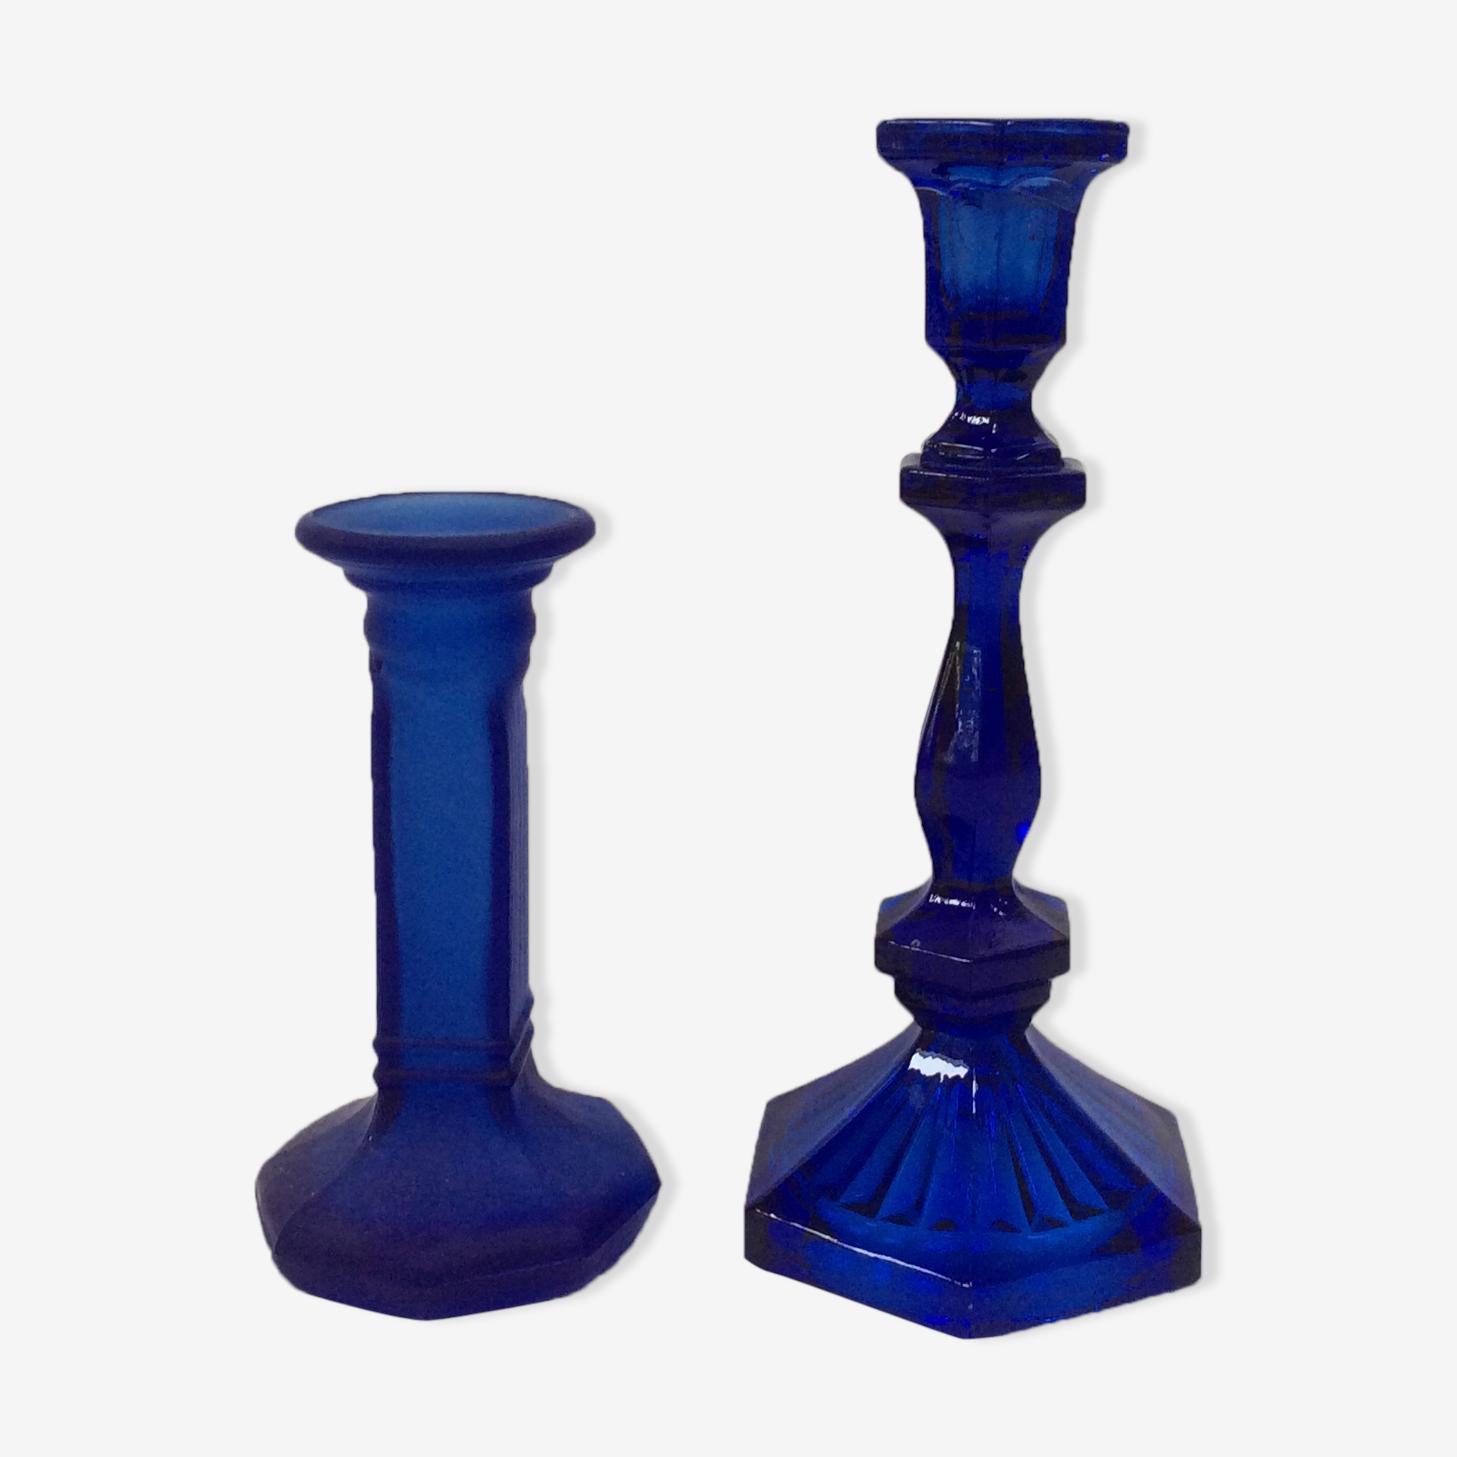 Pair of candlesticks blue klein